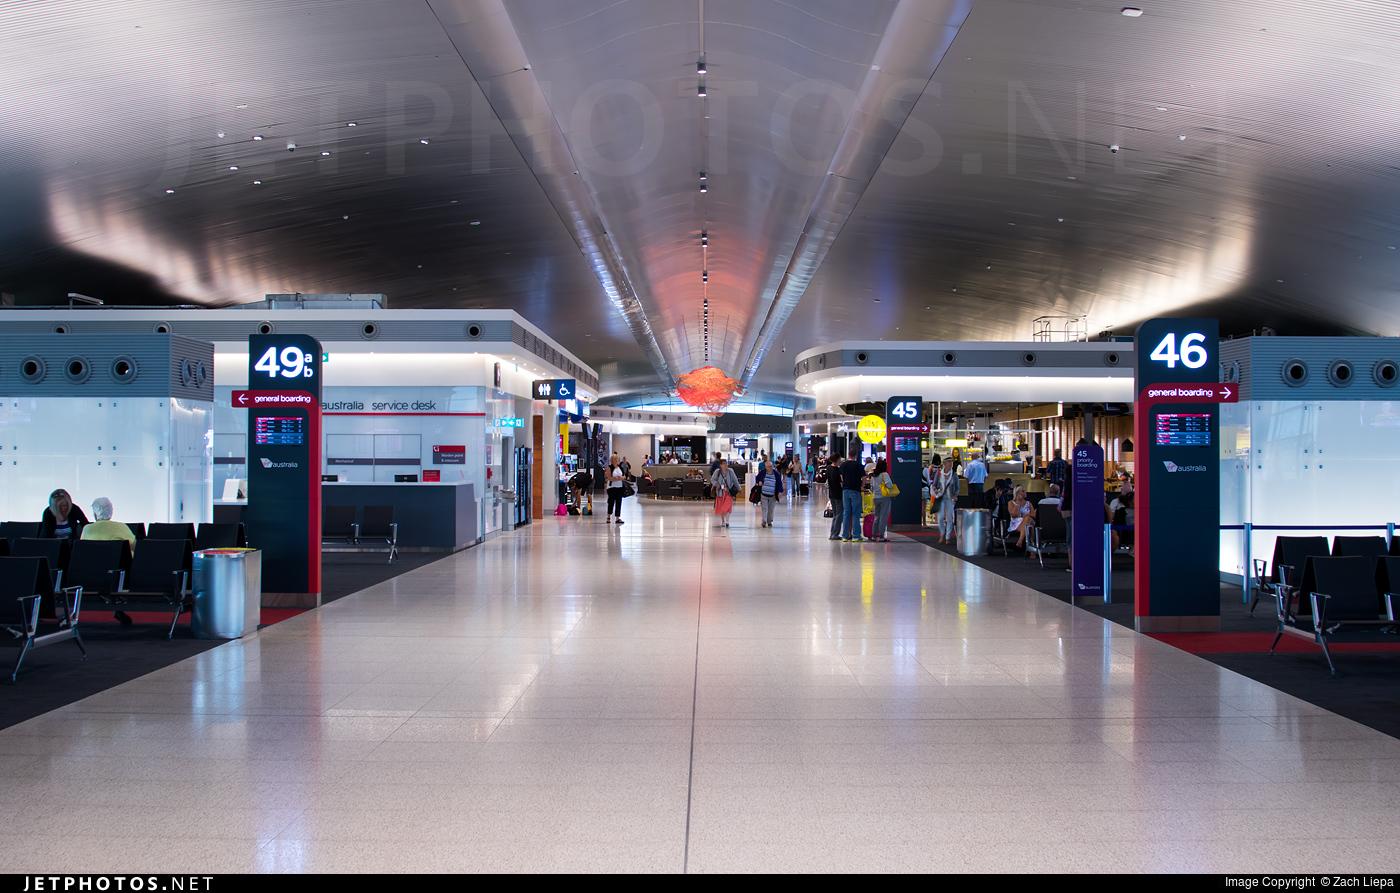 YPPH - Airport - Terminal